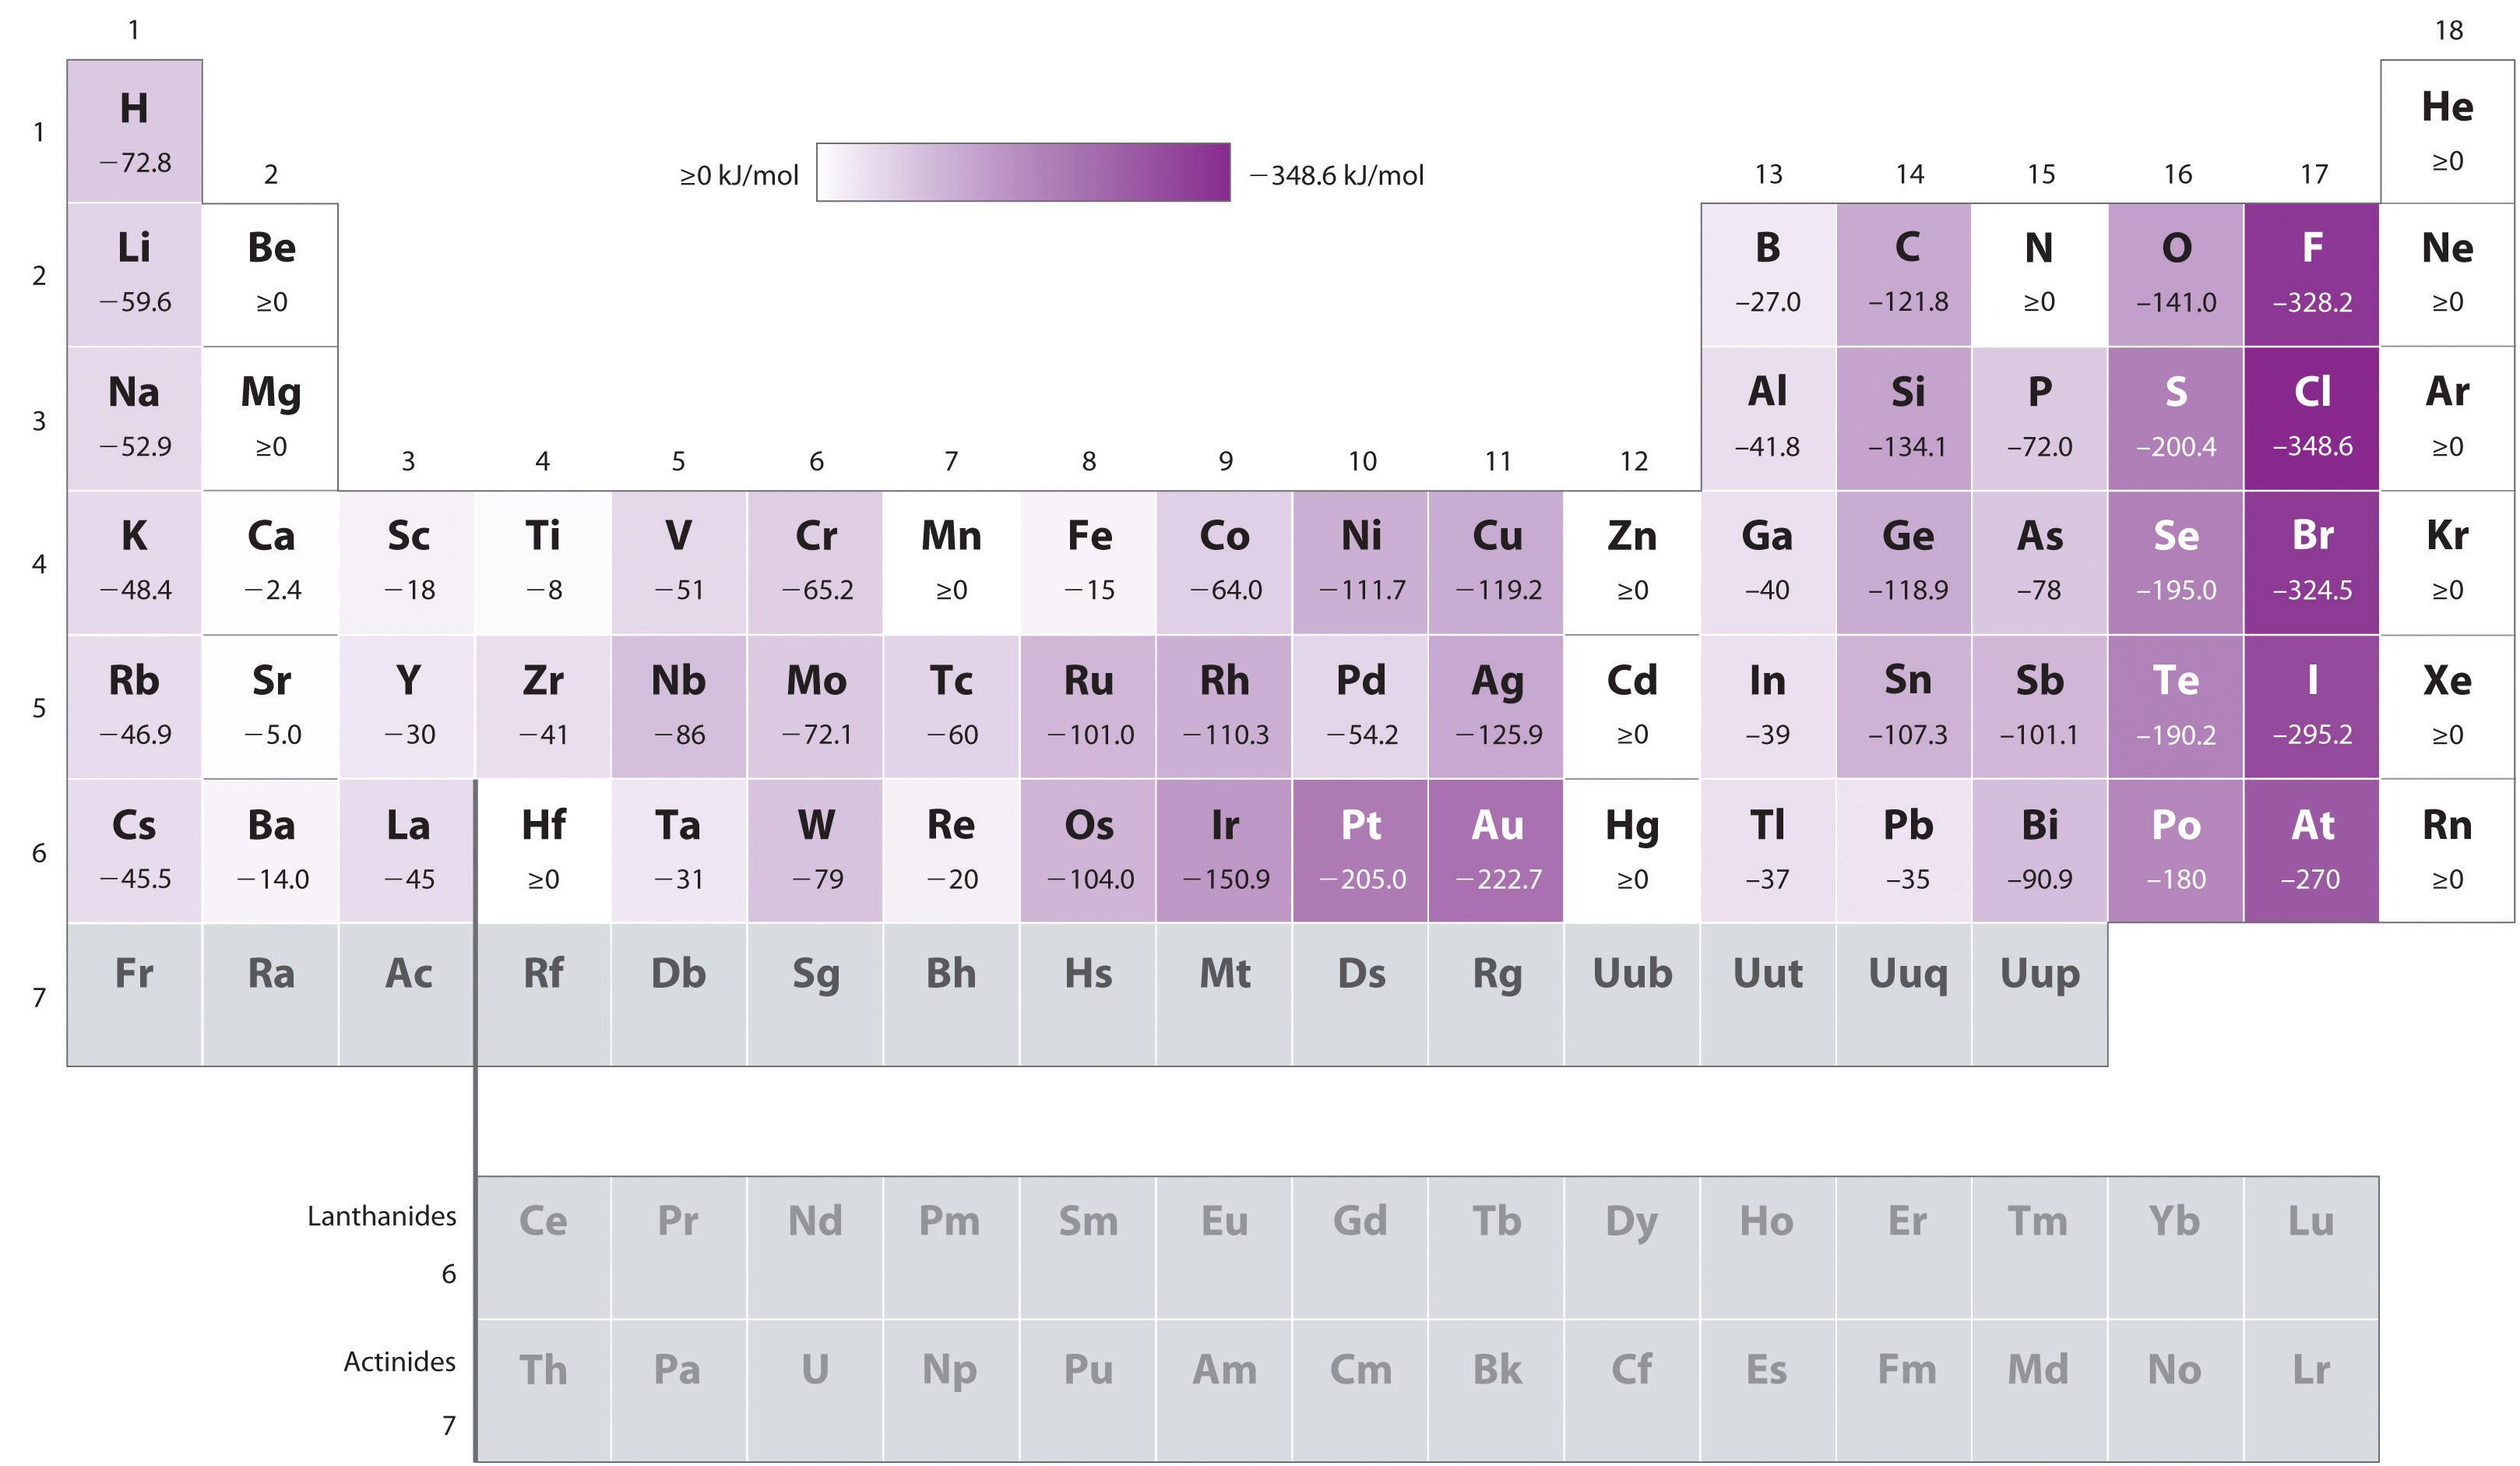 New ionic radius on the periodic table periodic periodic trends periodic ionic on table the radius ionic radius table 18 periodic for images displaying gamestrikefo Gallery